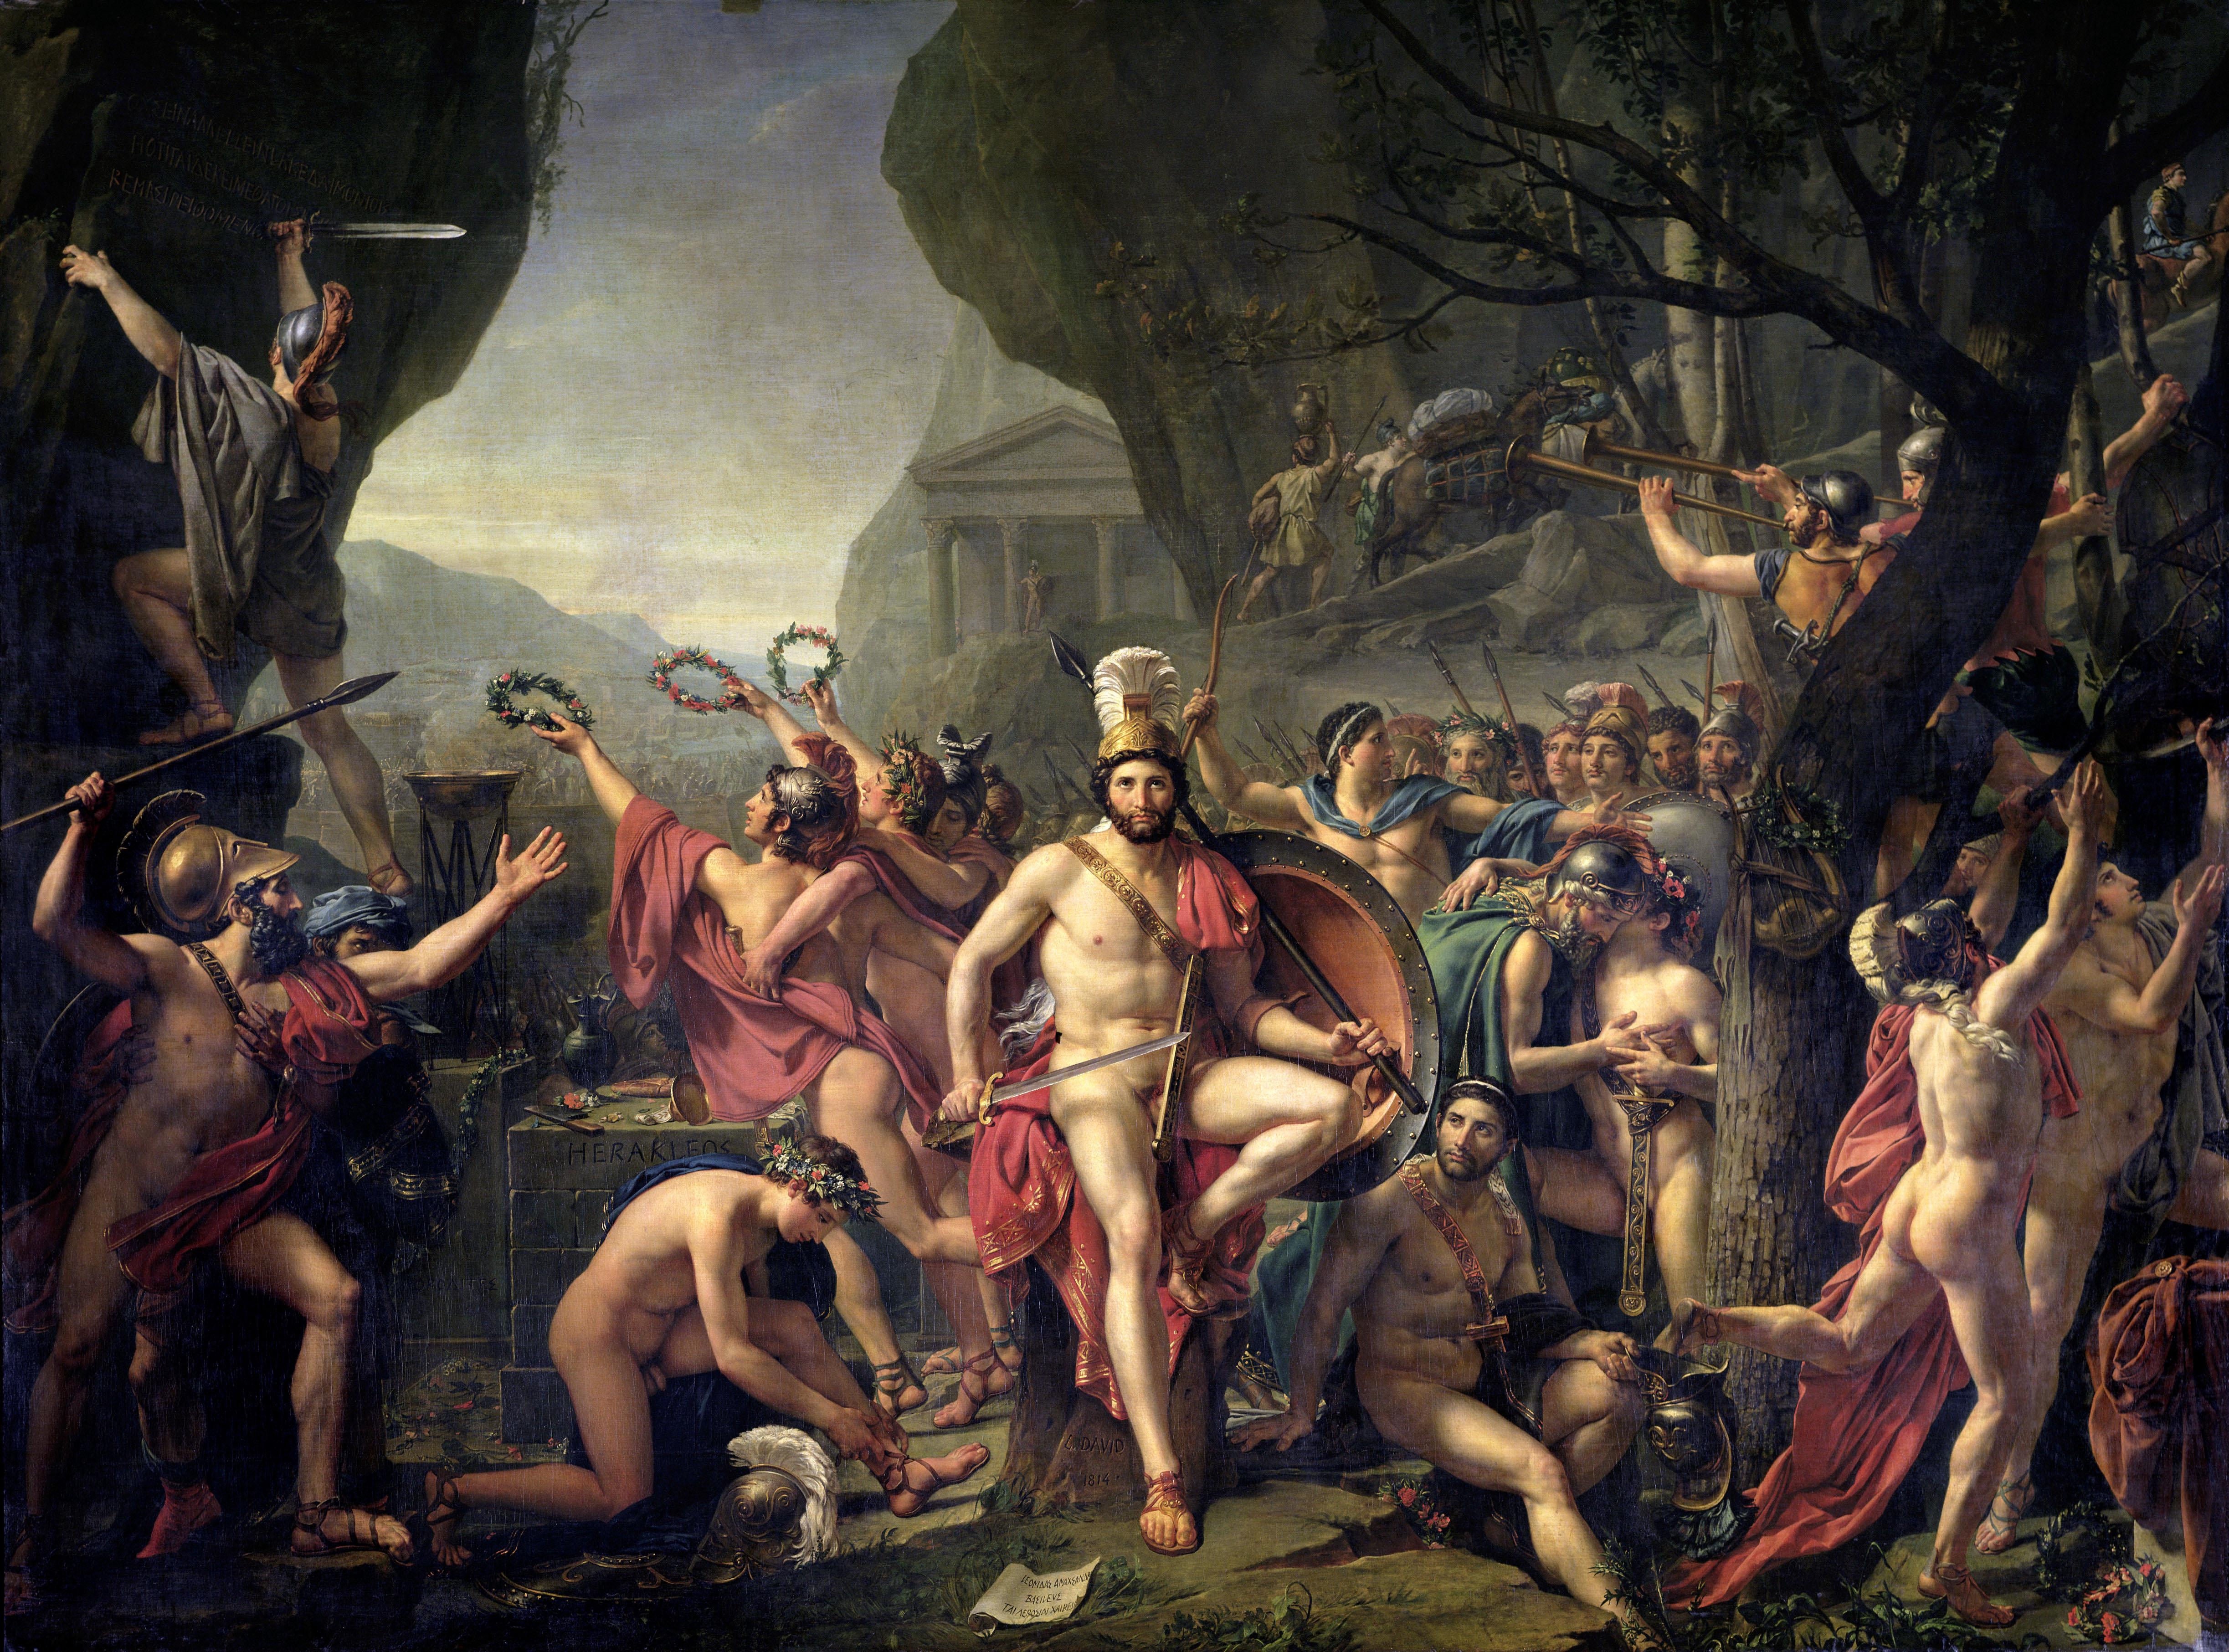 ÓLeo de Jacques Louis David. Leónidas en las Termópilas